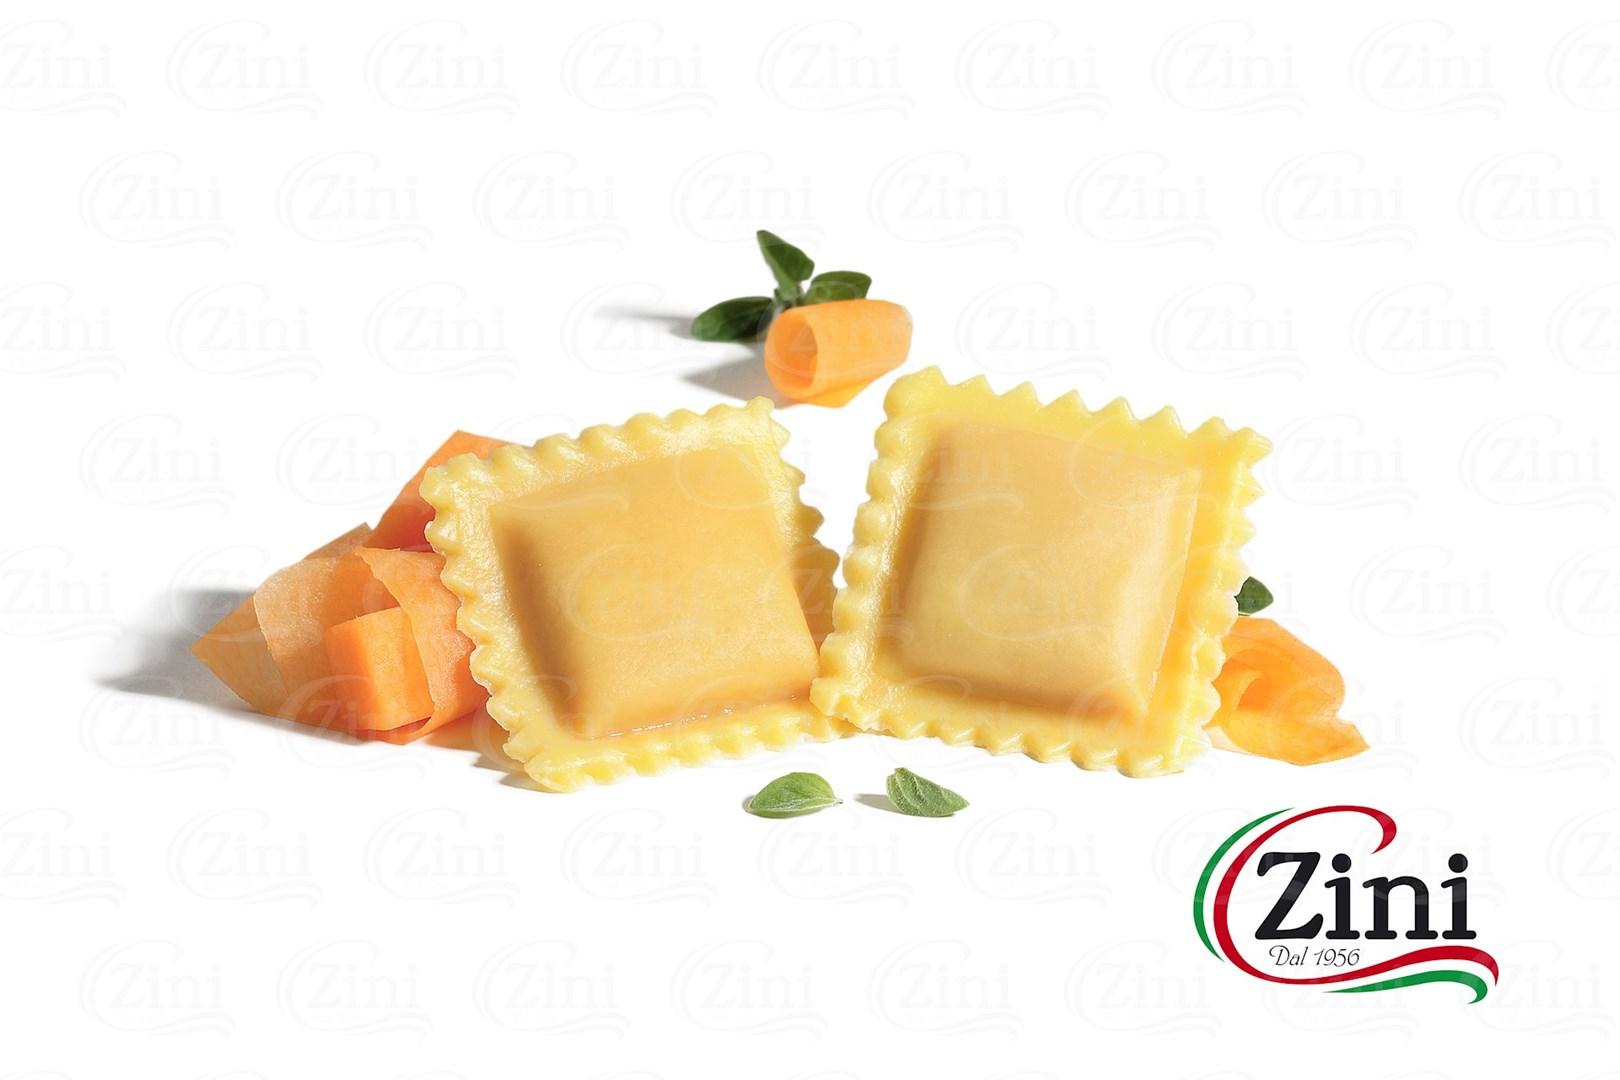 Productafbeelding Tortelli di zucca (pompoen) 1000 g